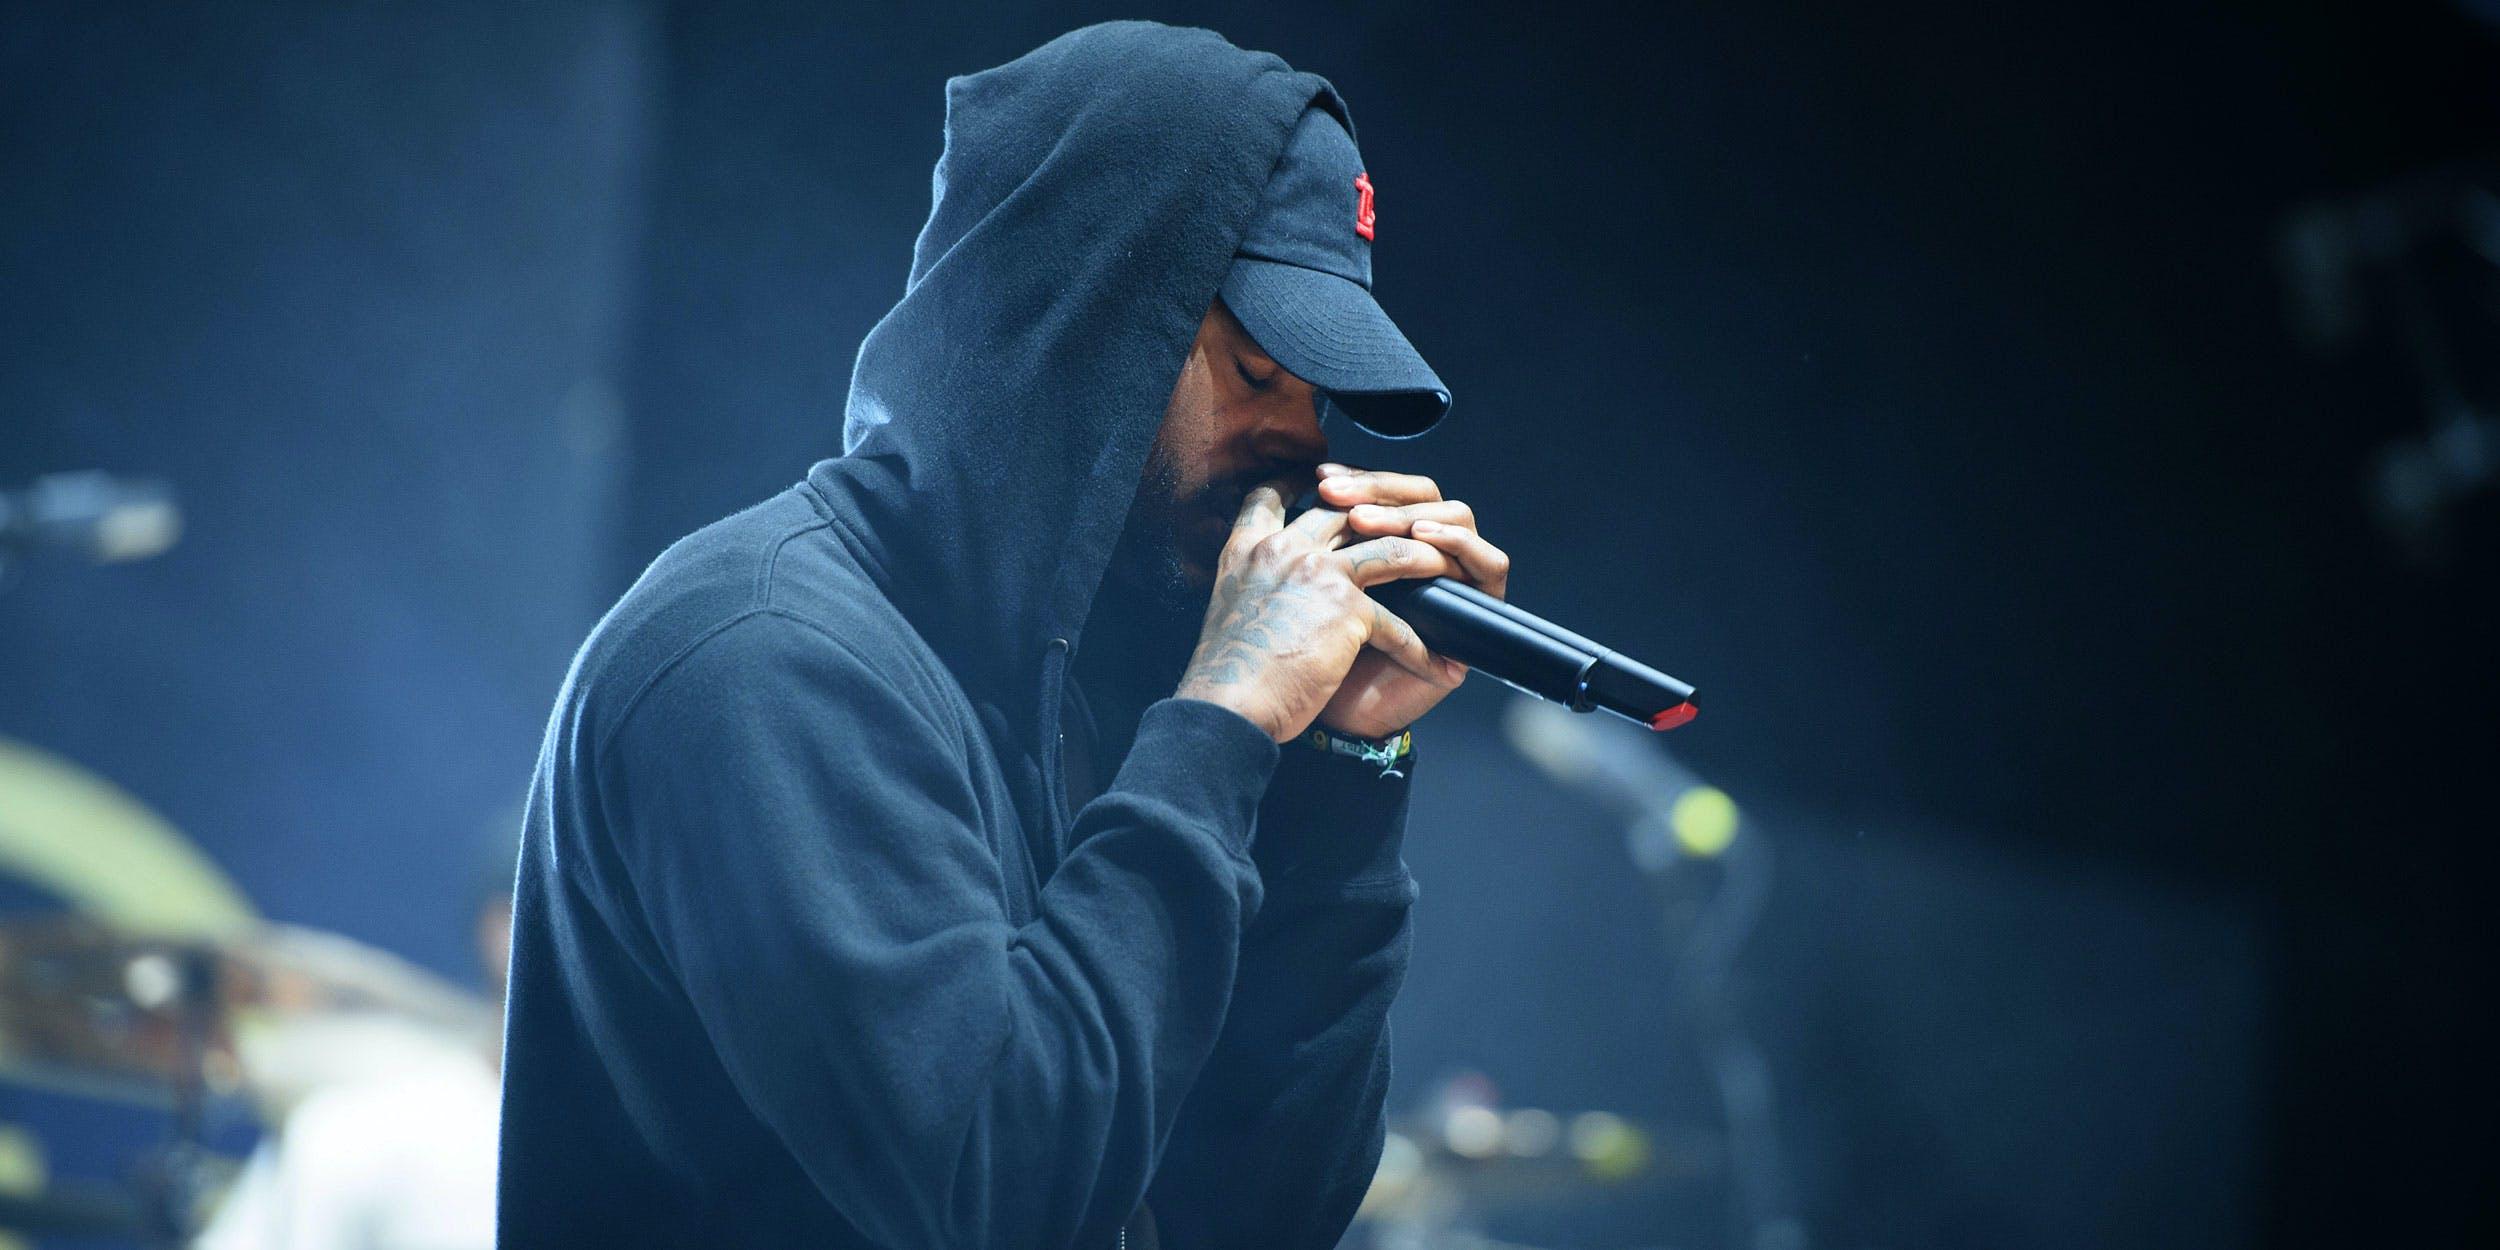 Bryson Tiller says depression impacted his album True to Self